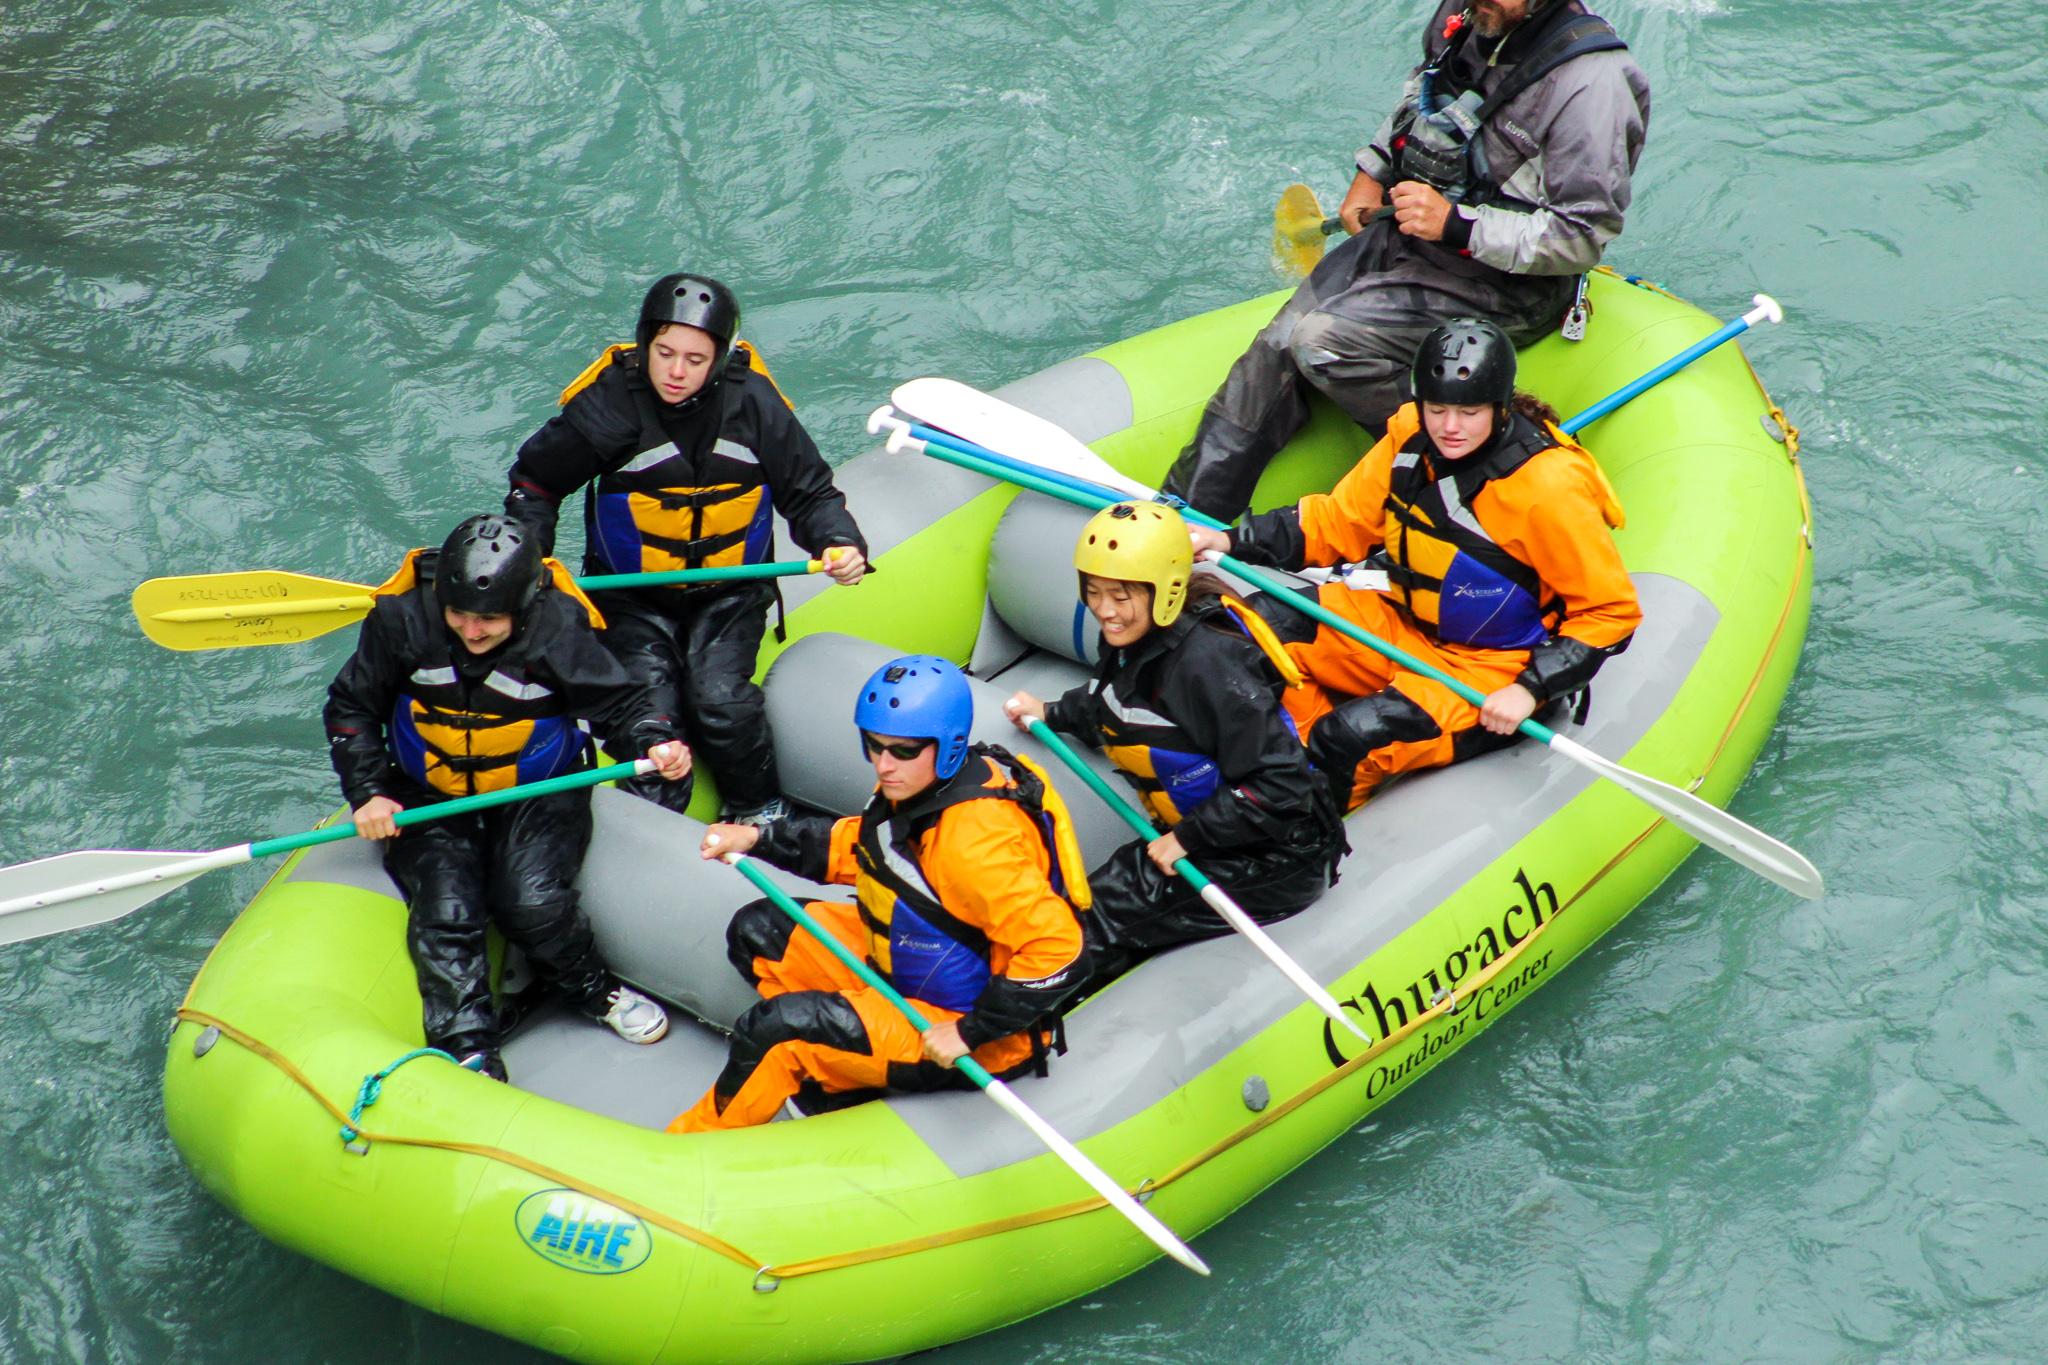 Summer Program - Promoting Volunteerism | Travel For Teens: USA for Older Teens - Alaska Service and Adventure